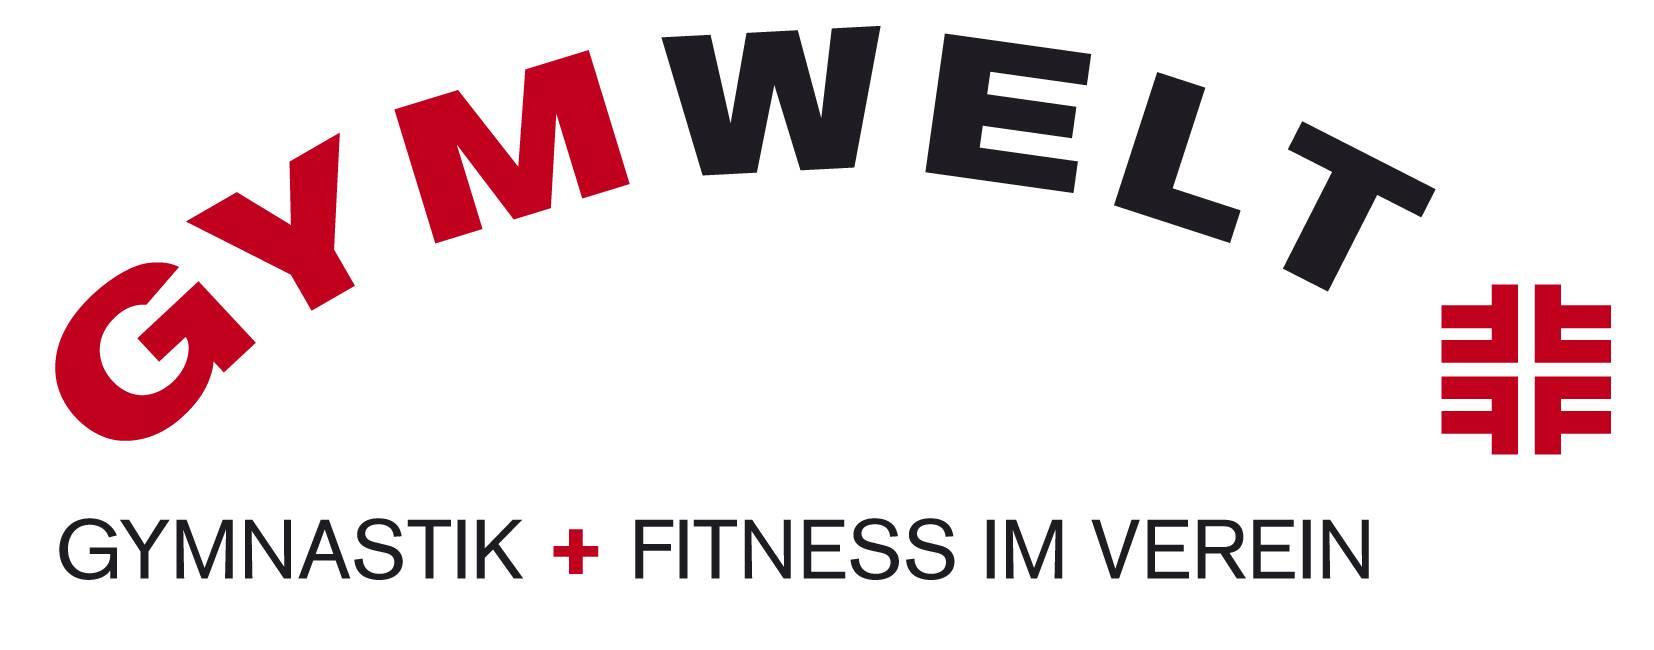 GYMWELT Gymanstik + Fitness im Verein